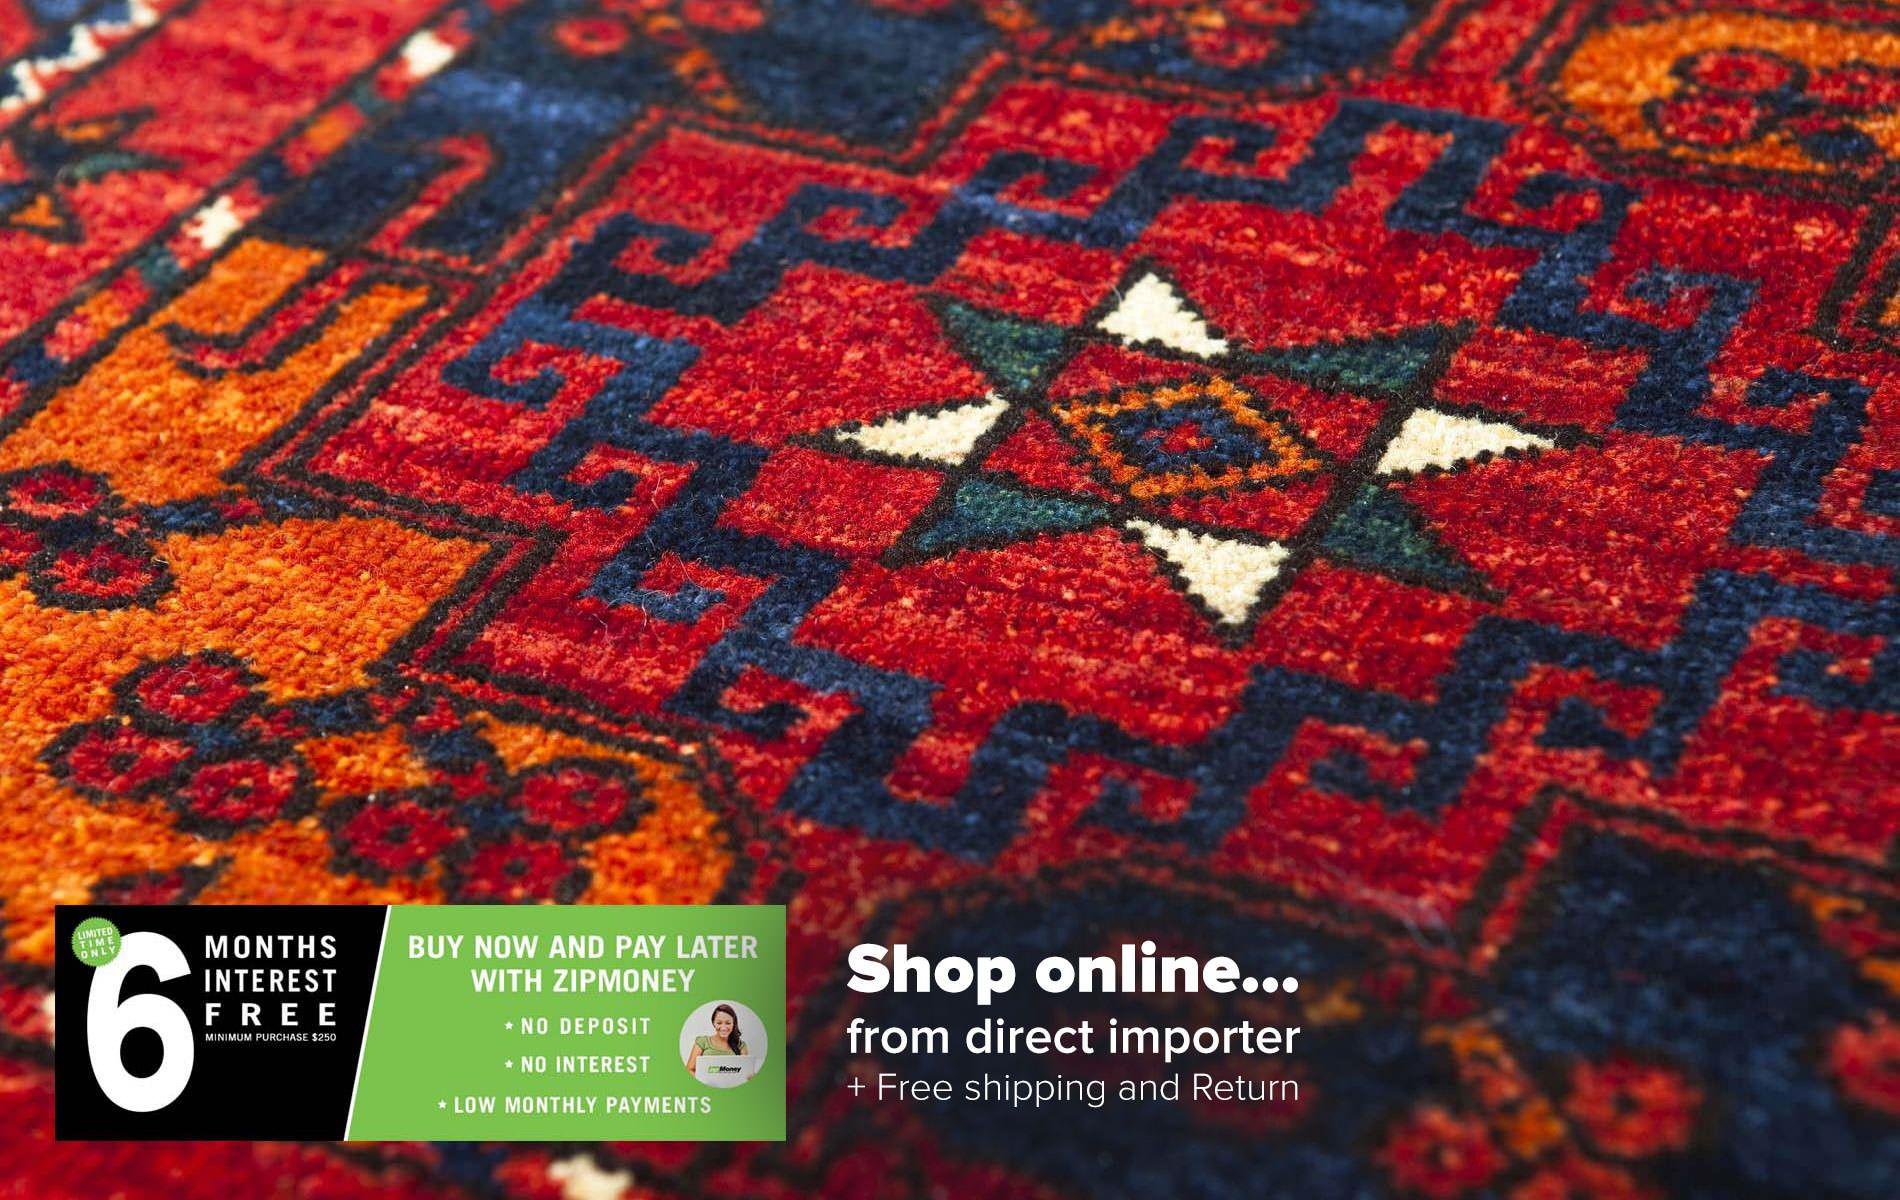 persian rugs australia offers a beautiful range of persian rugs designer rugs cheap rugs